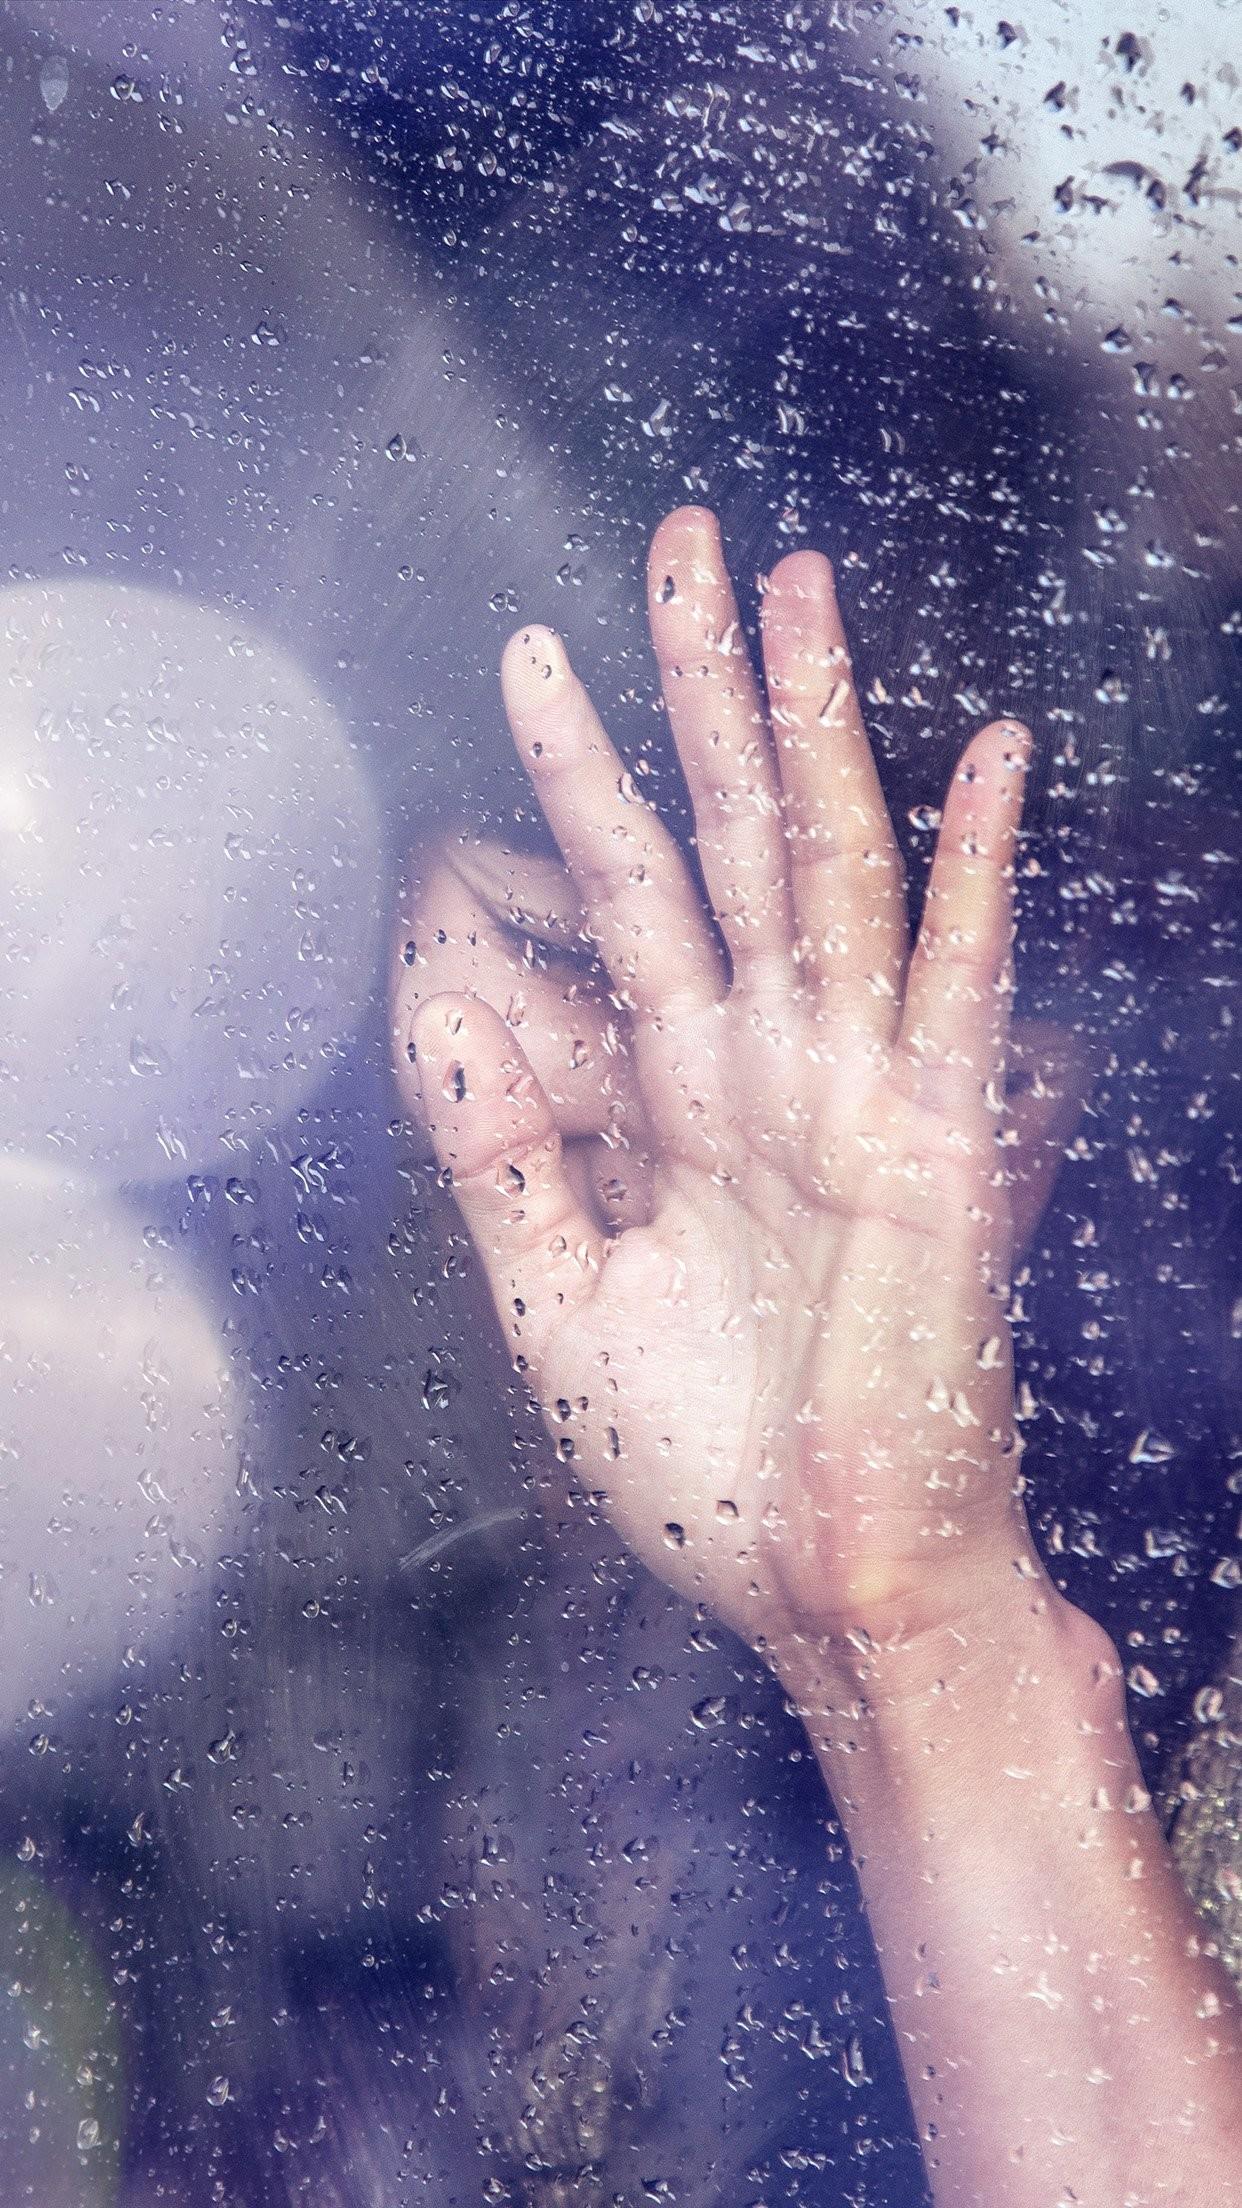 … rain girl shy asian nature hand flare iphone 7 wallpaper …